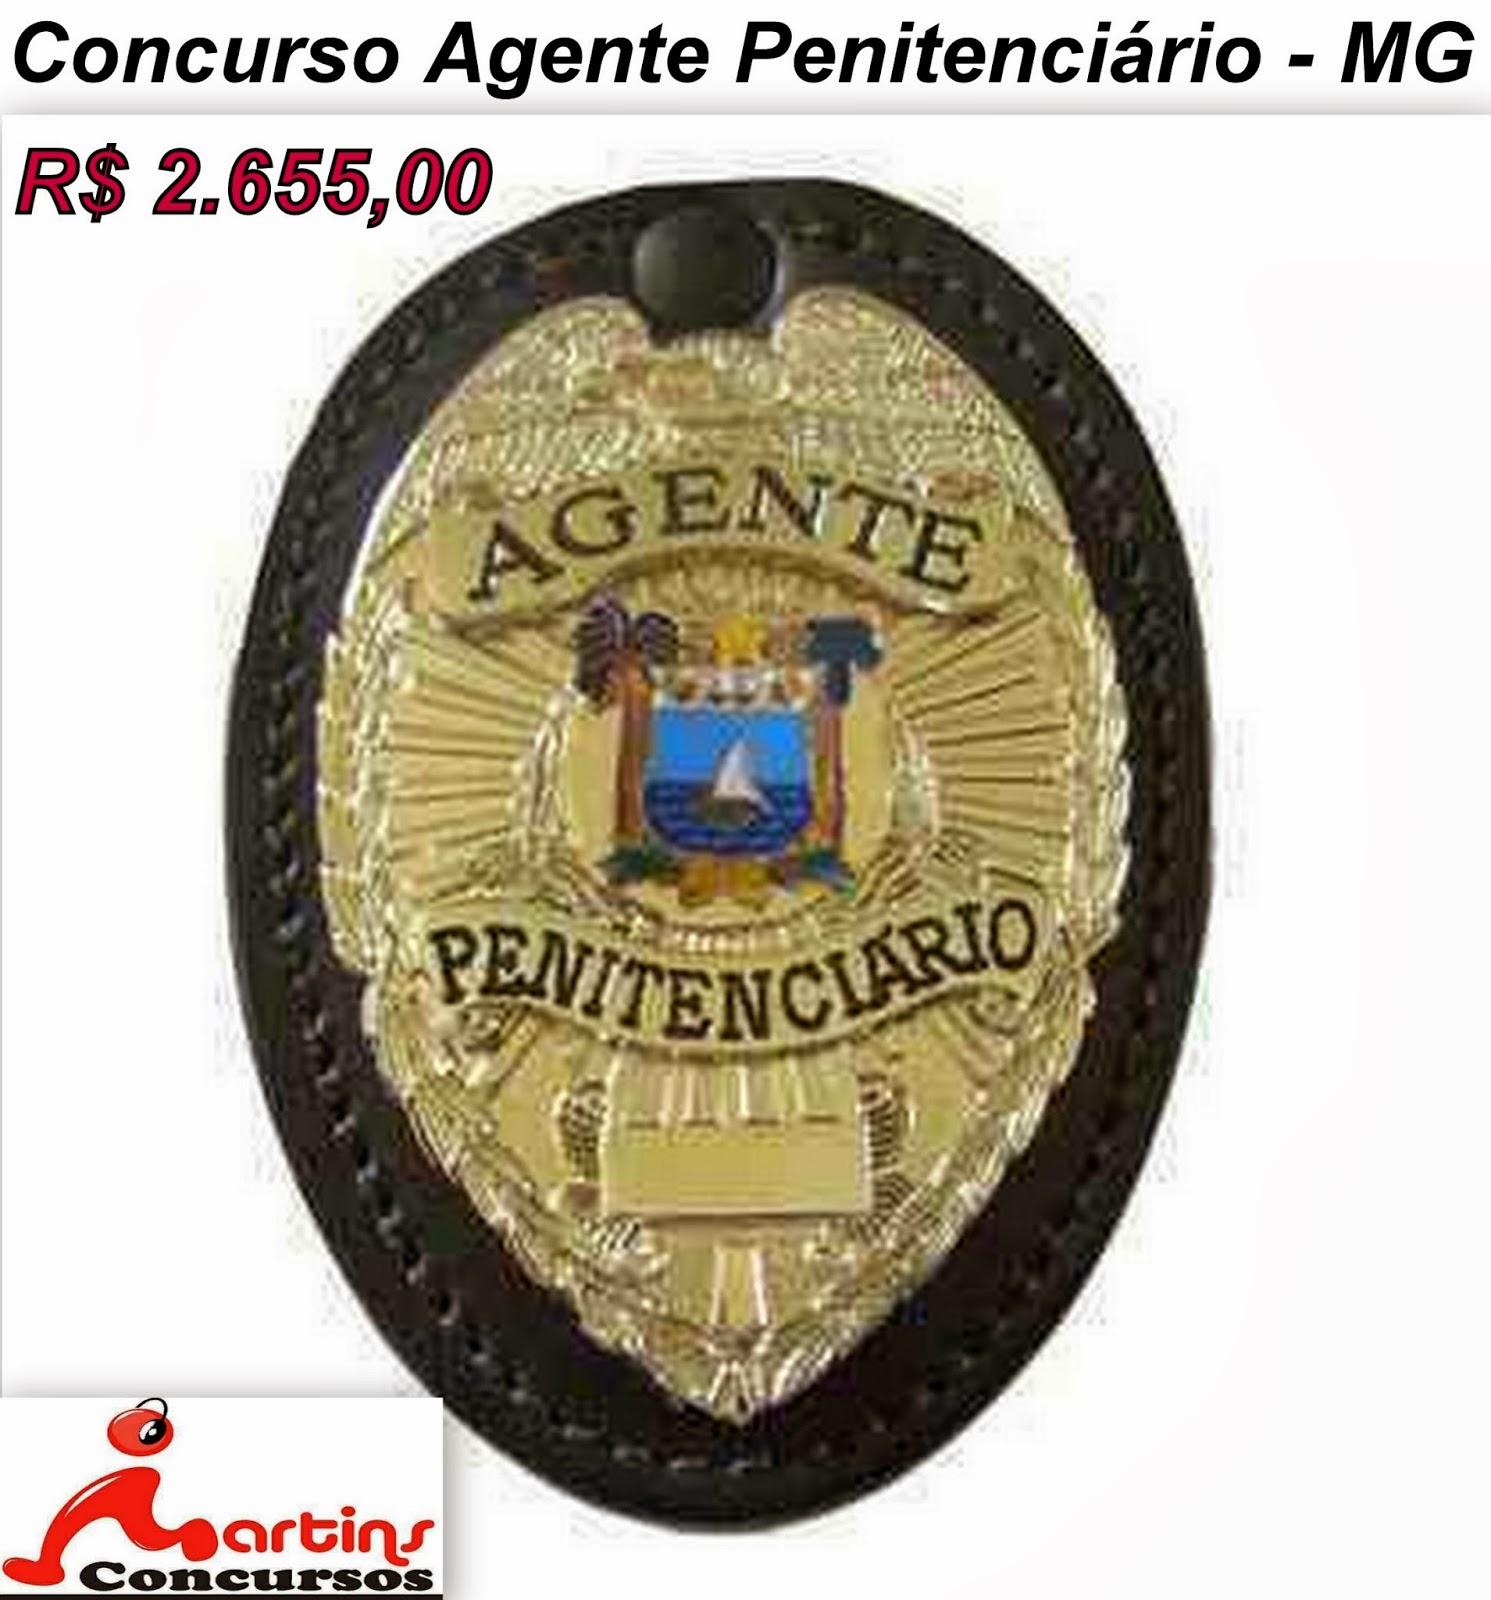 Apostila Agente Penitenciario Mg Download